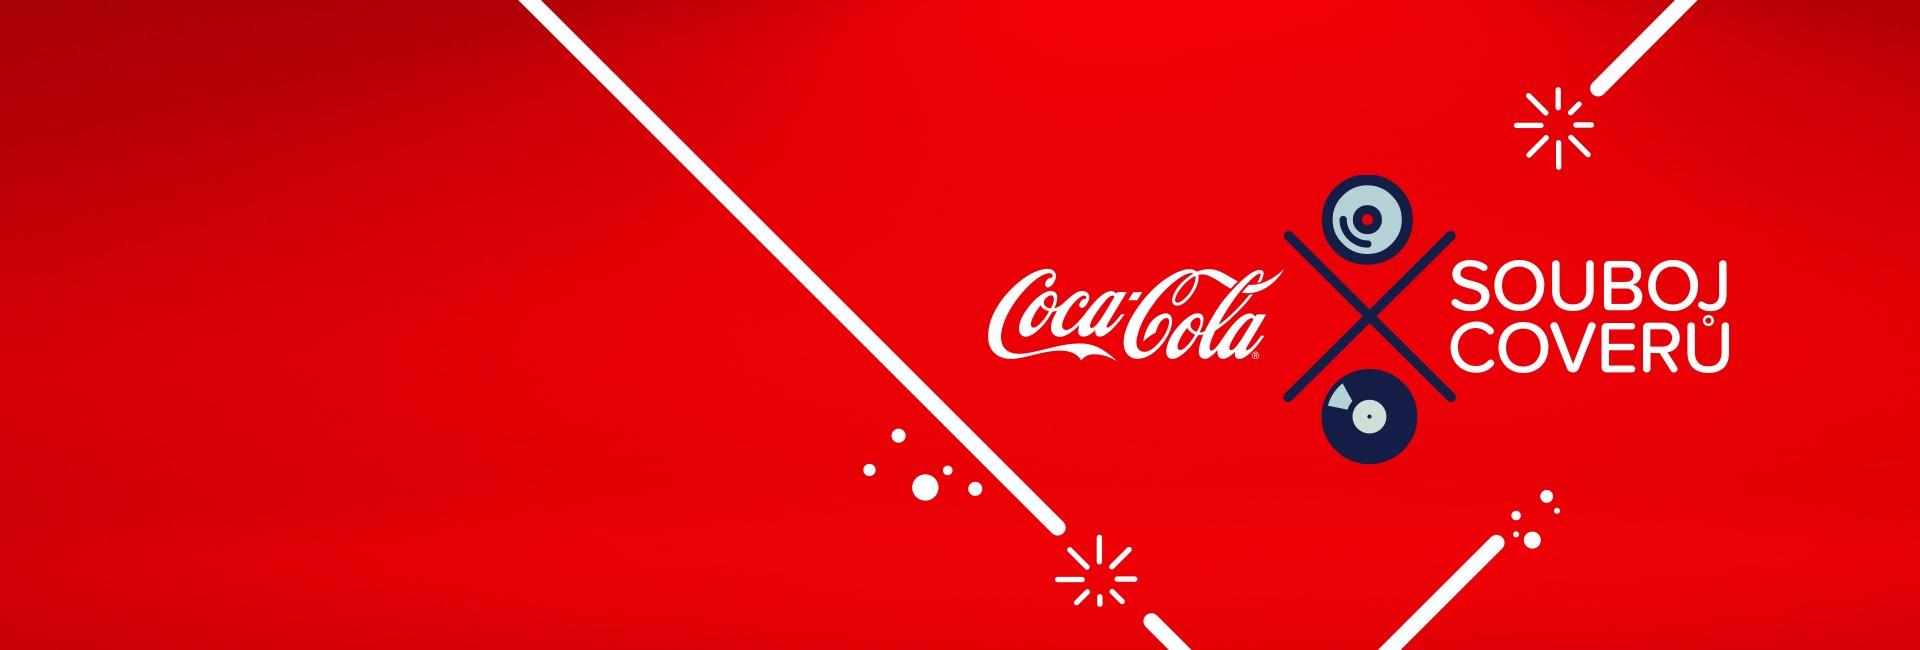 Coca-Cola Souboj coverů